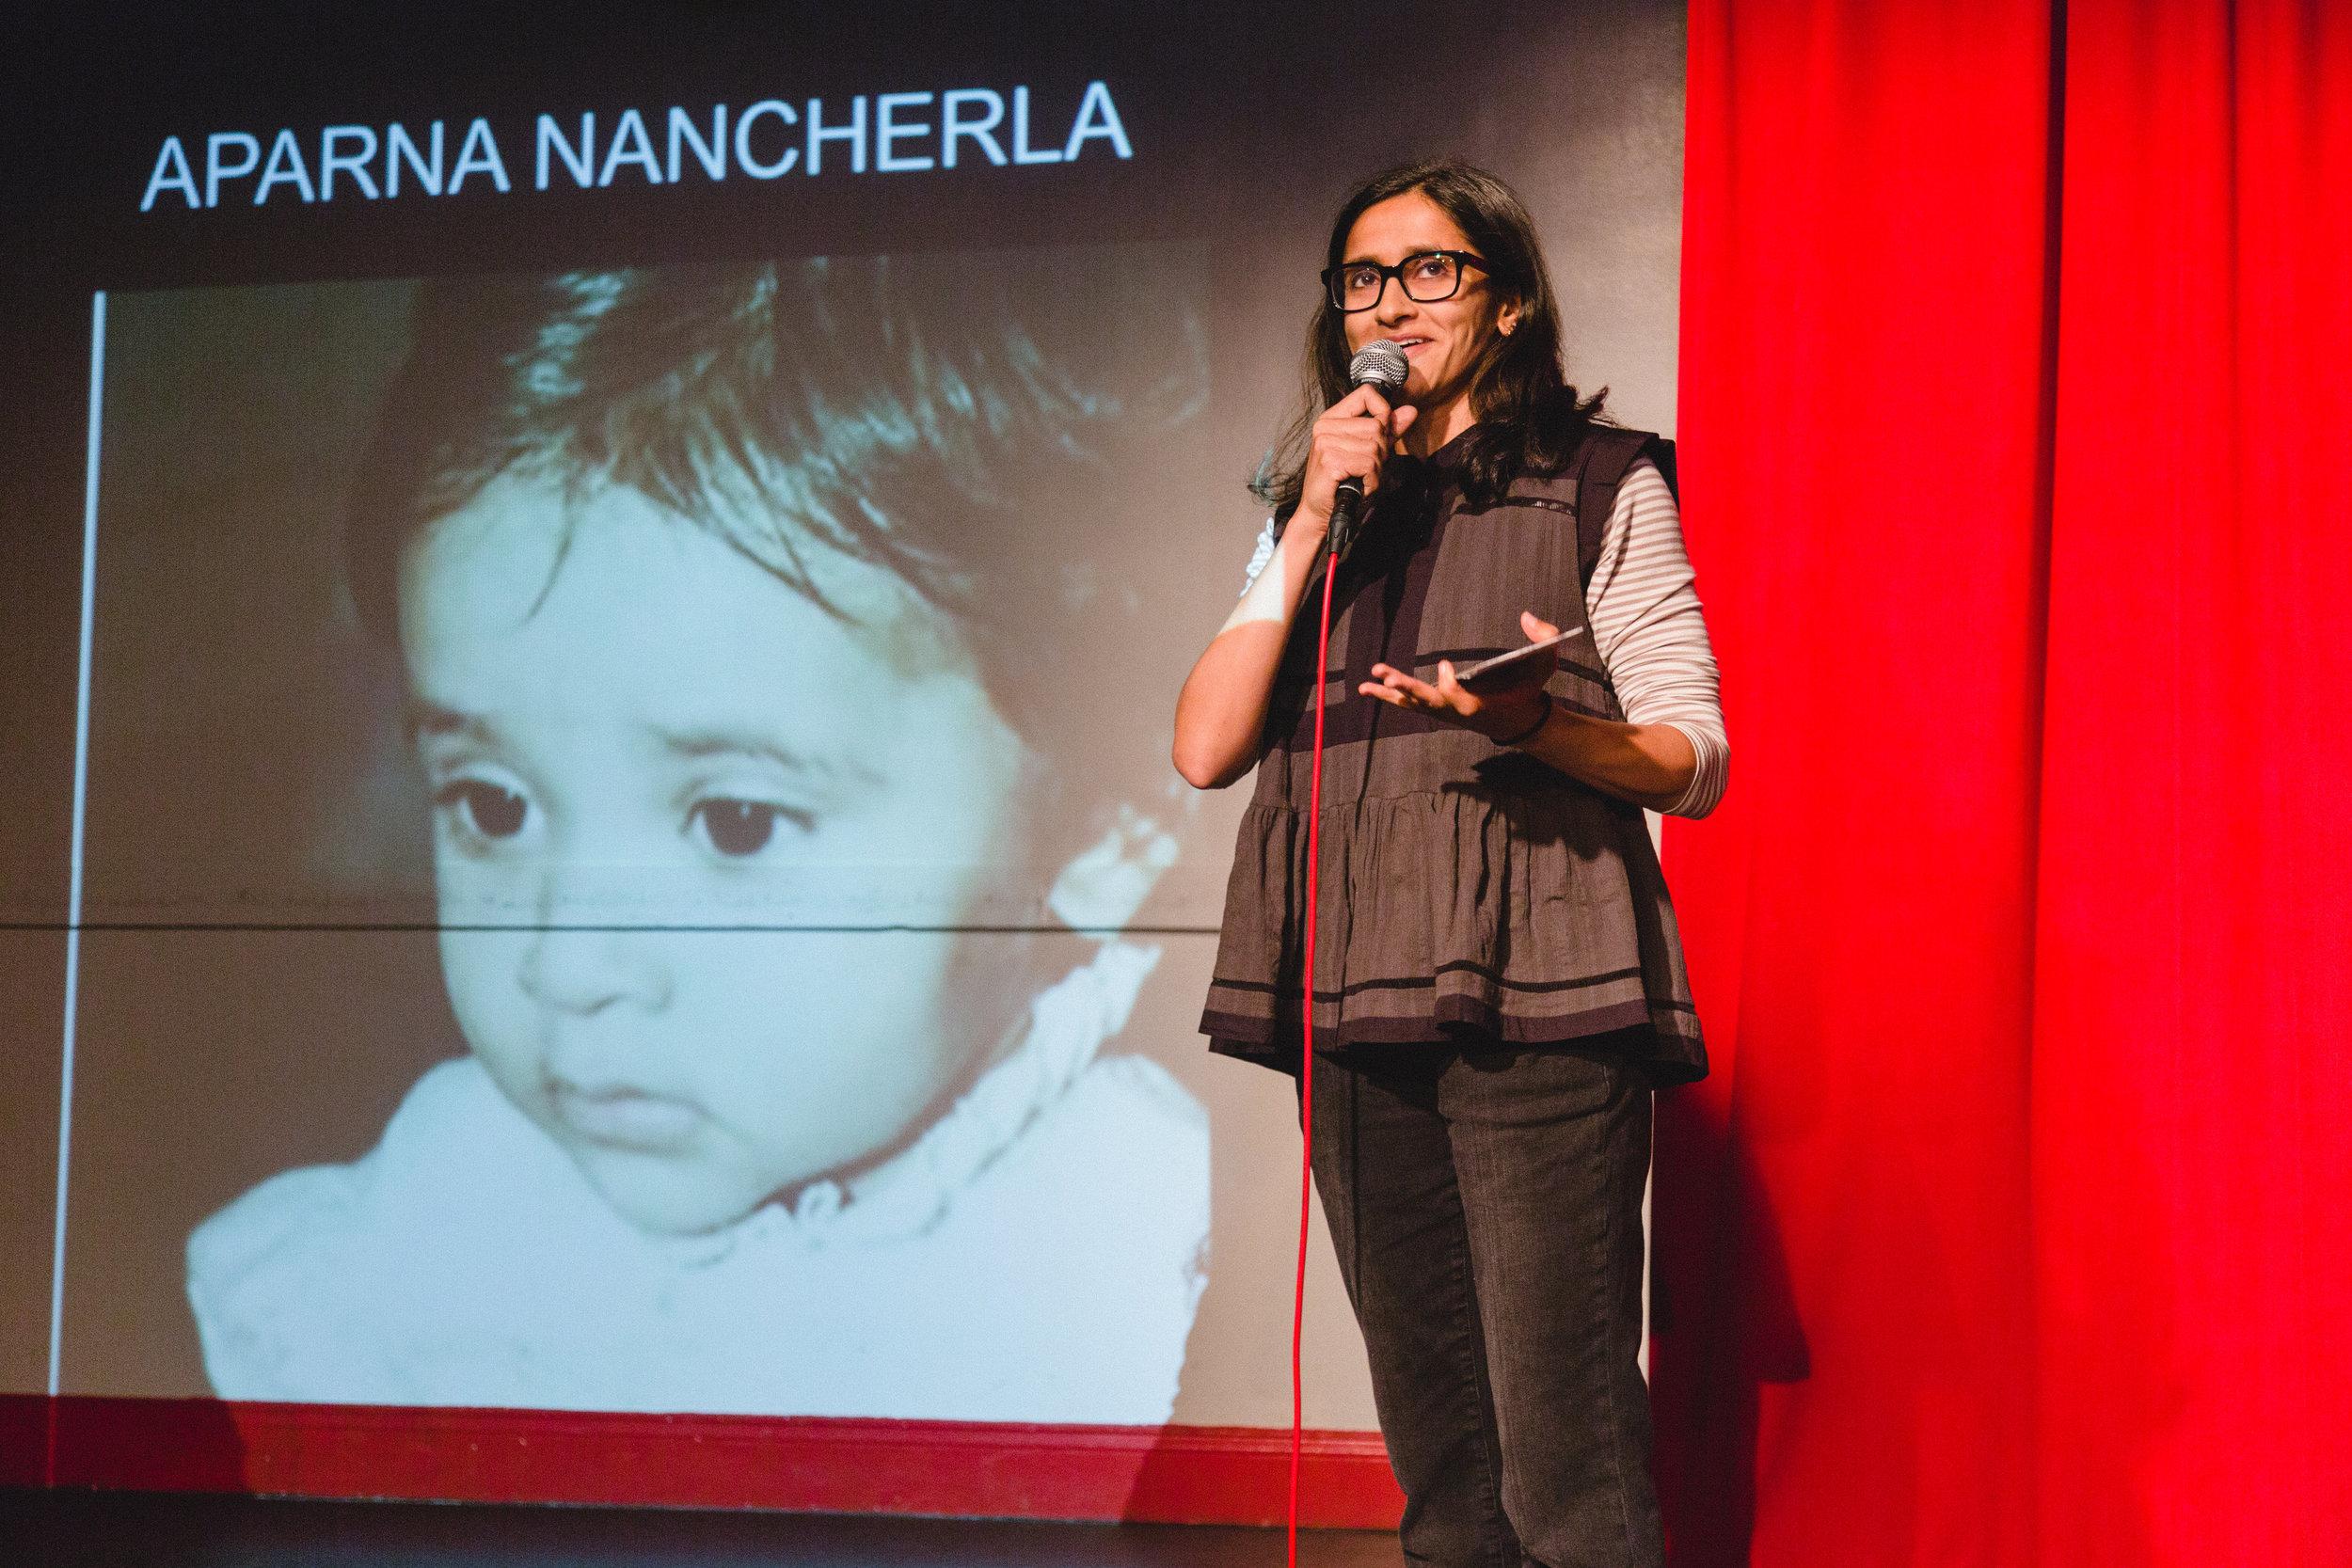 Aparna Nancherla, 11/8/17